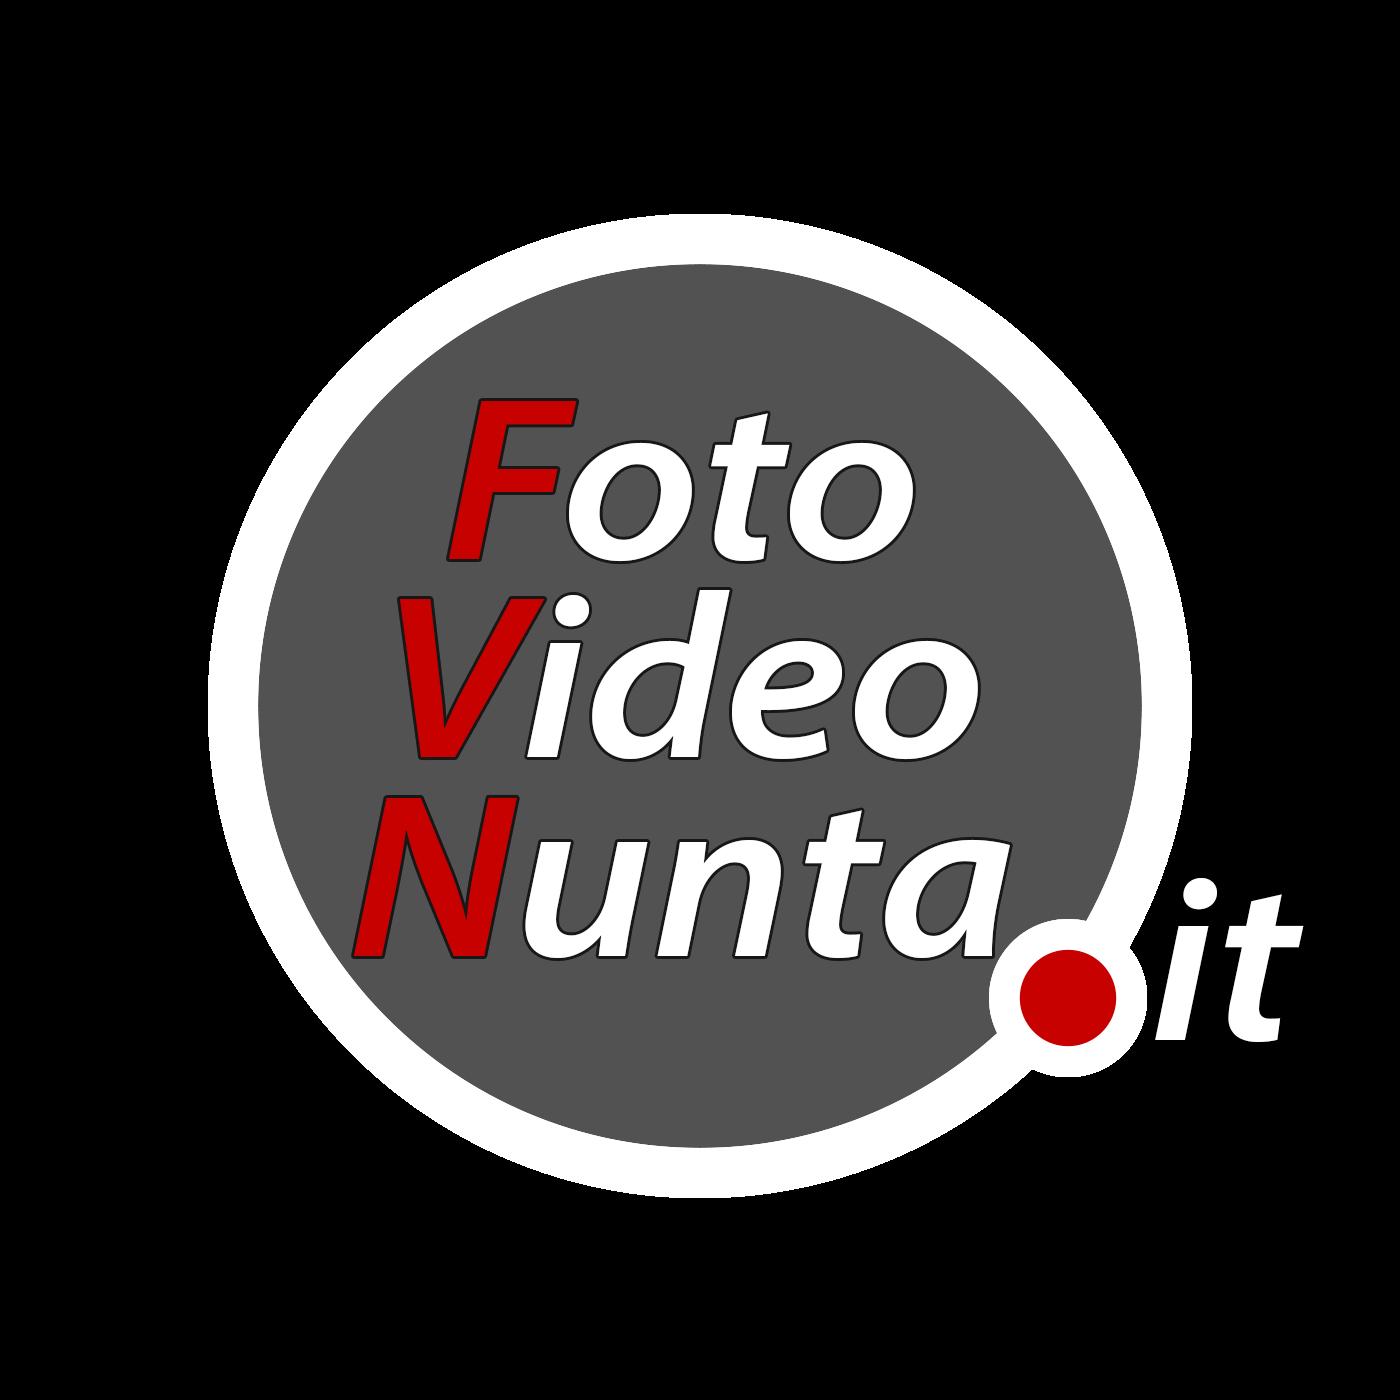 Foto Video Nunta Roma Italia